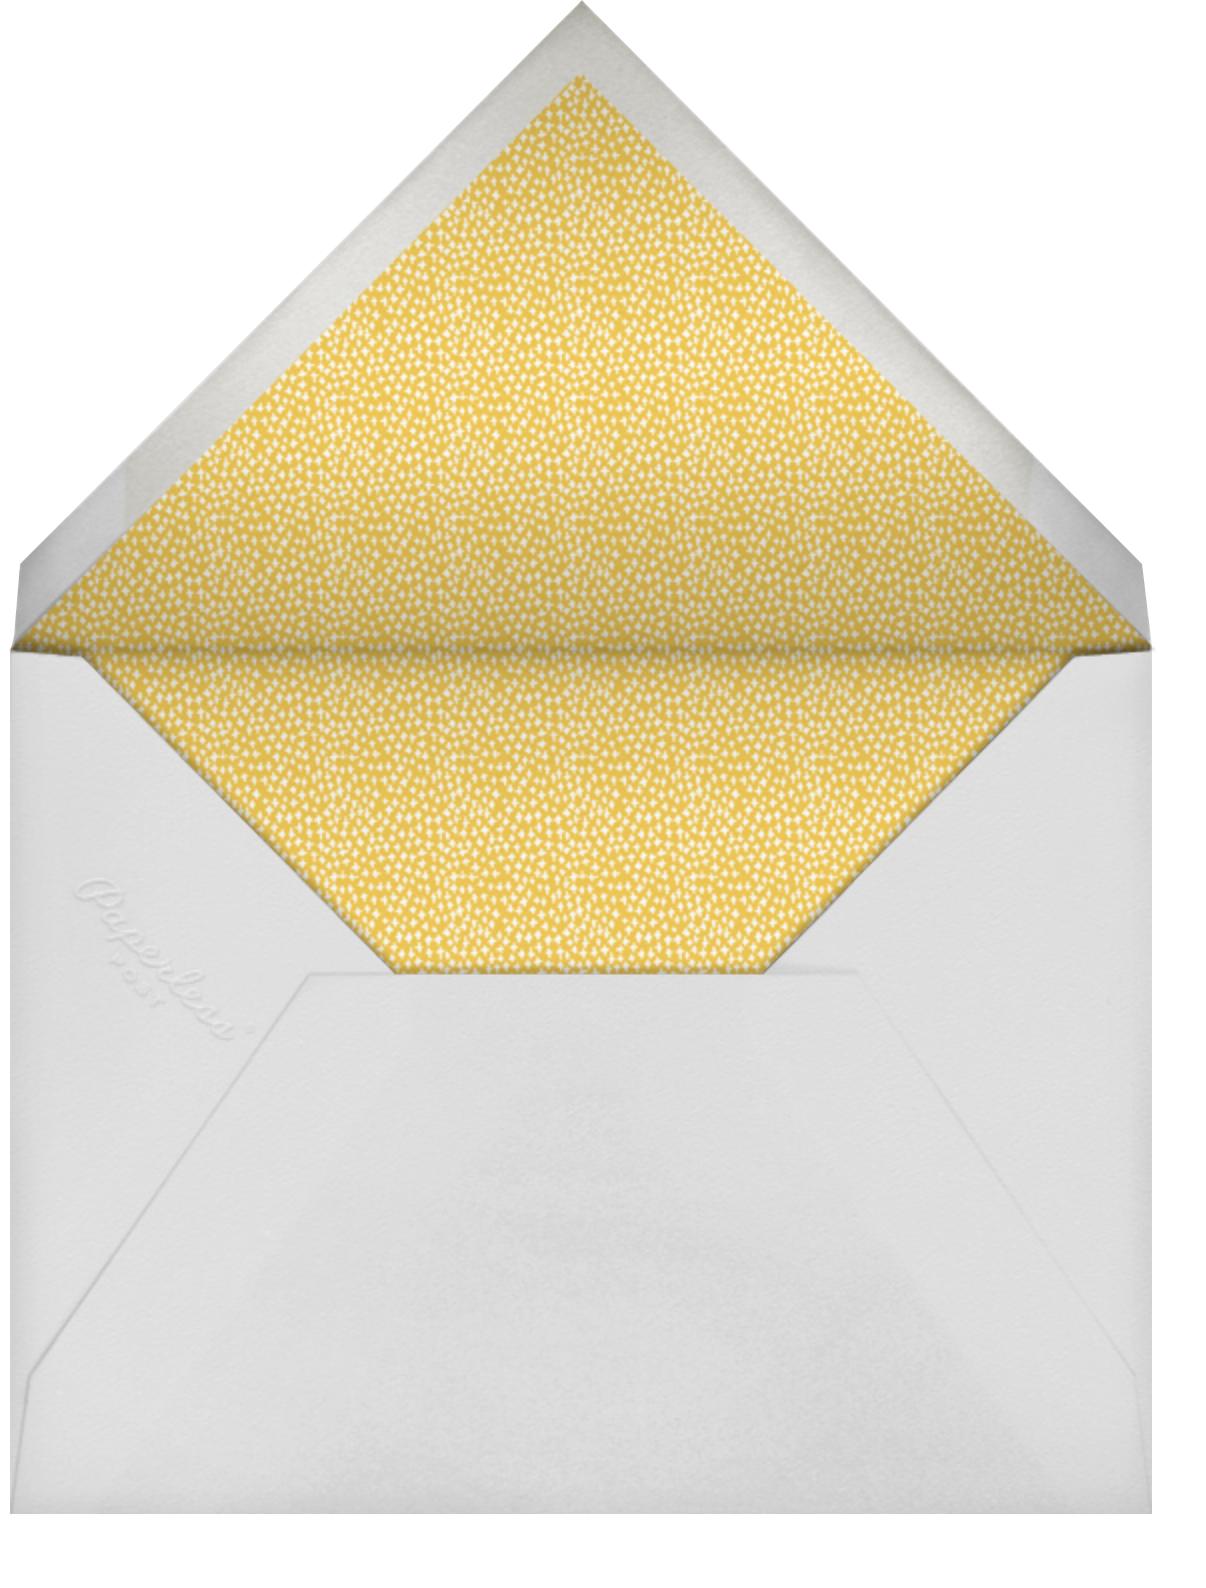 My Perception's Clouded - Mr. Boddington's Studio - Envelope